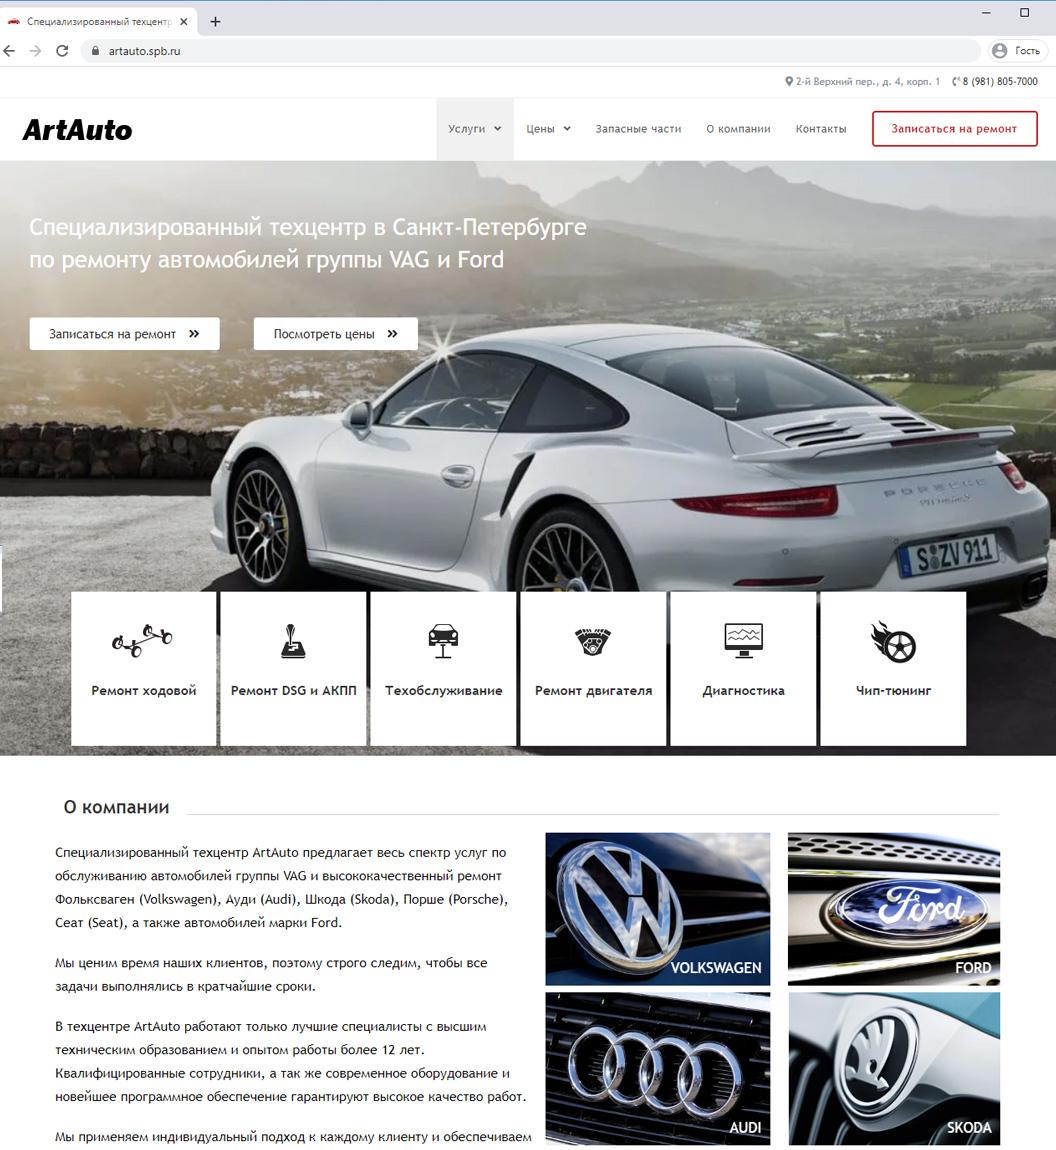 Сайт техцентра ArtAuto для VAG и Ford